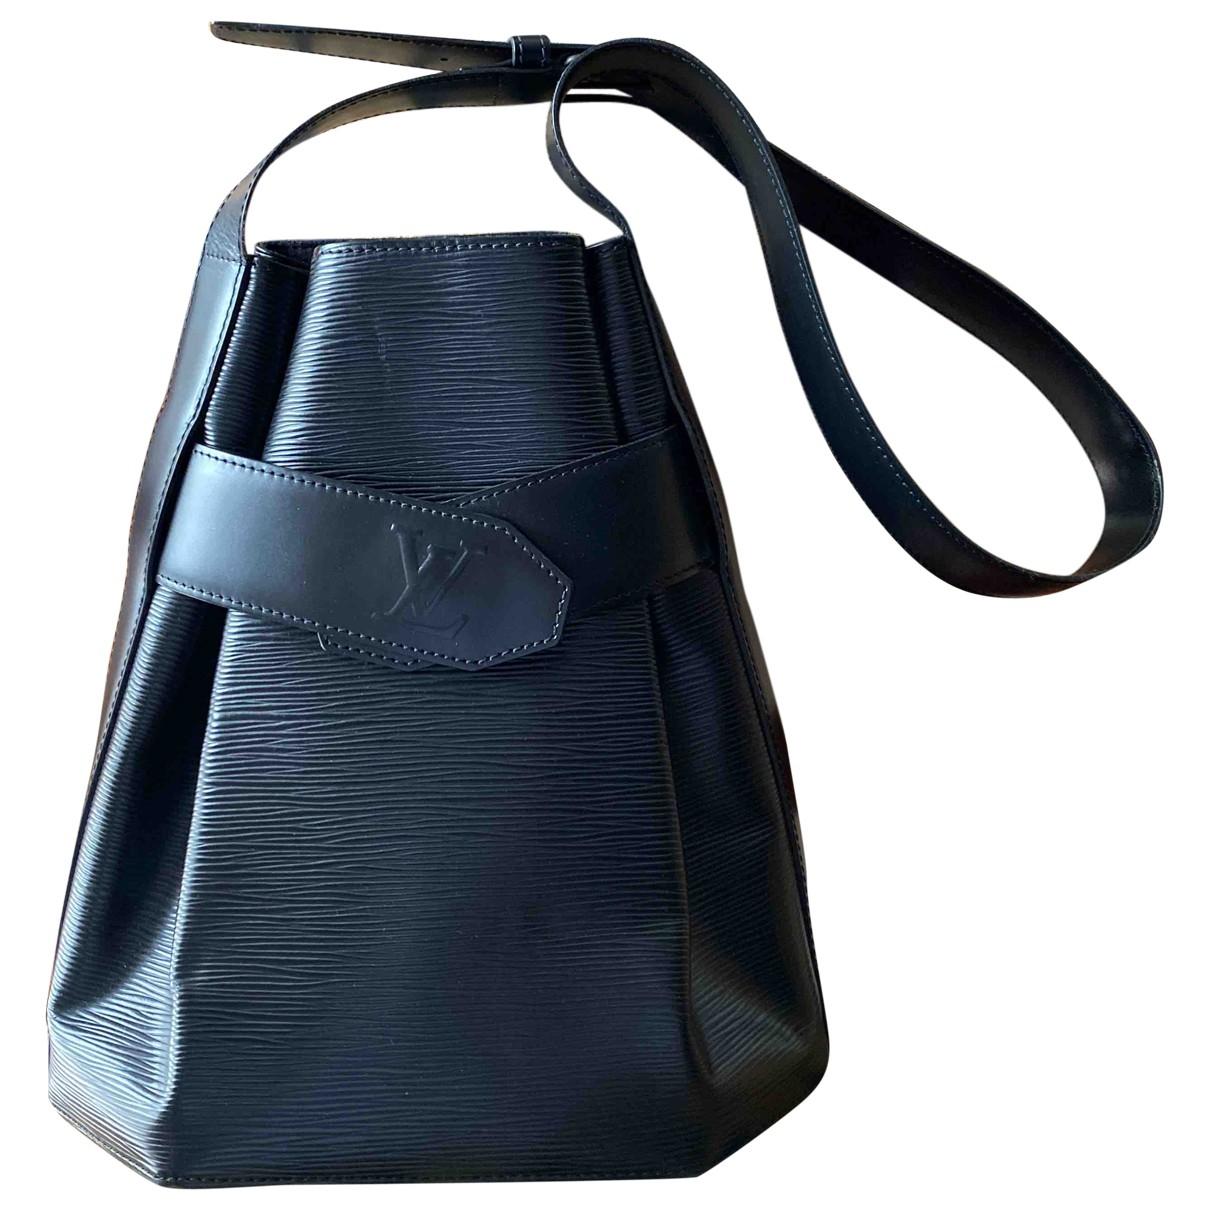 Louis Vuitton Sac d'épaule Black Leather handbag for Women N